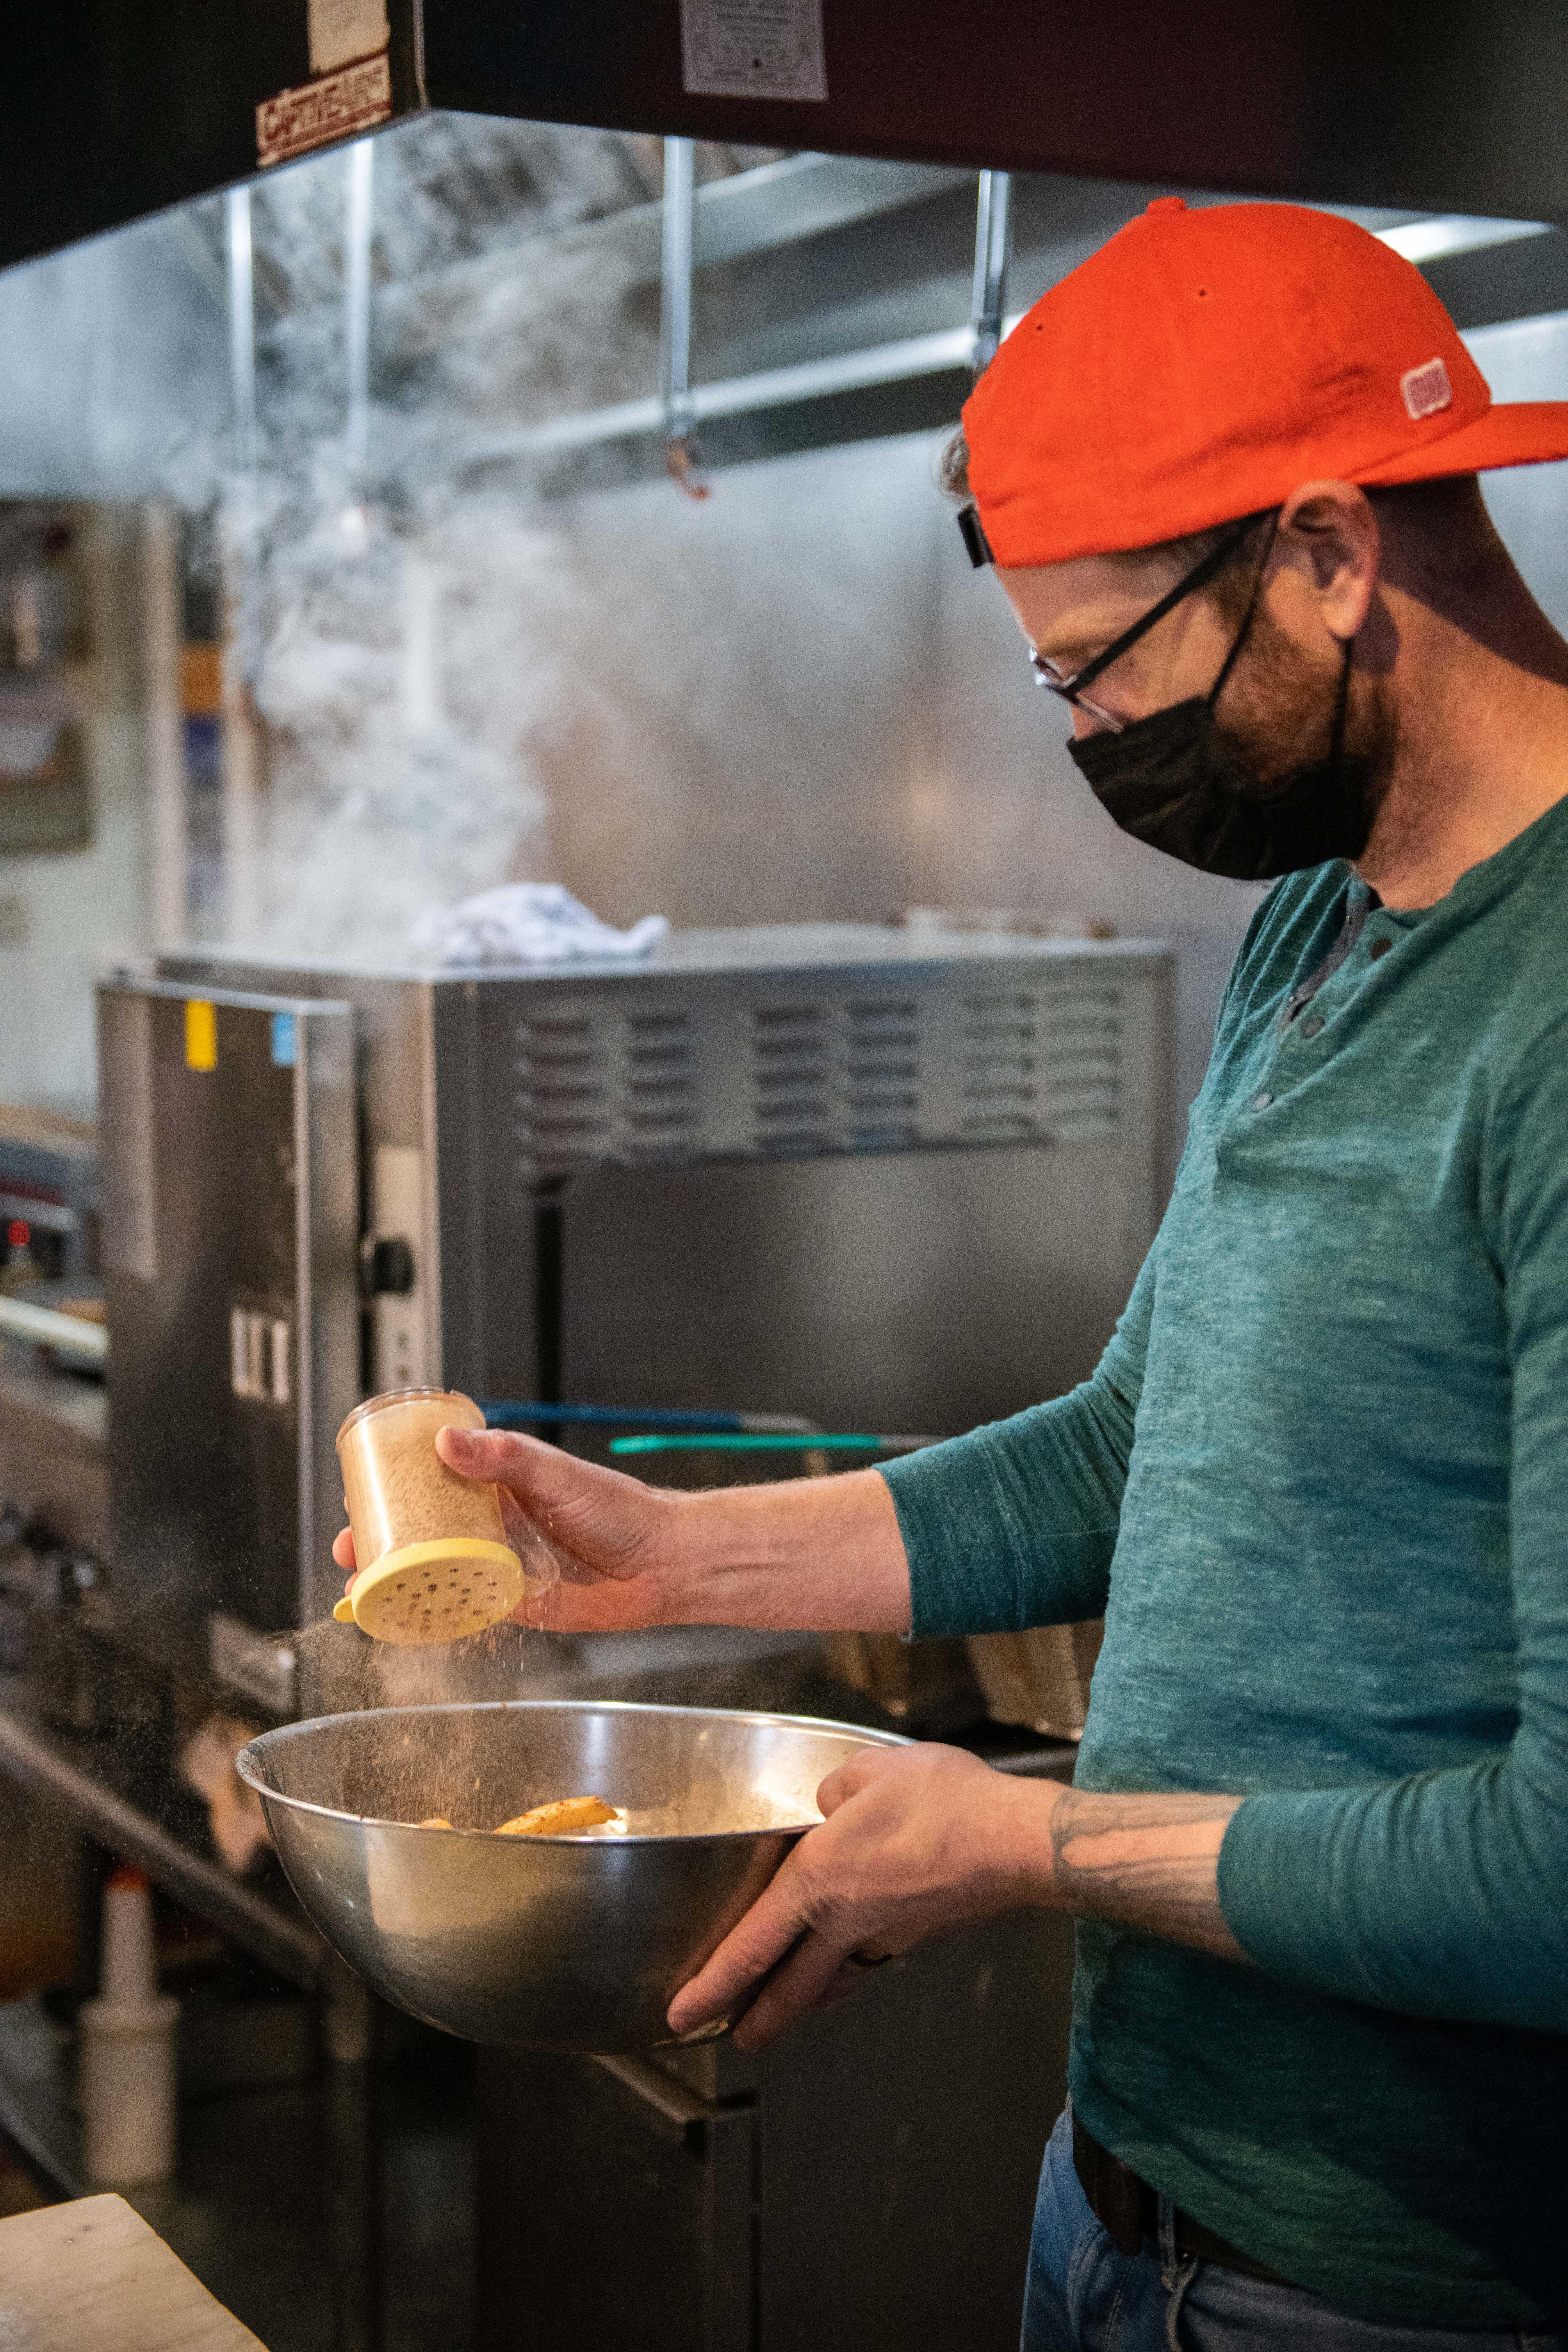 A Rama Mama chef seasons a bowl of fries.